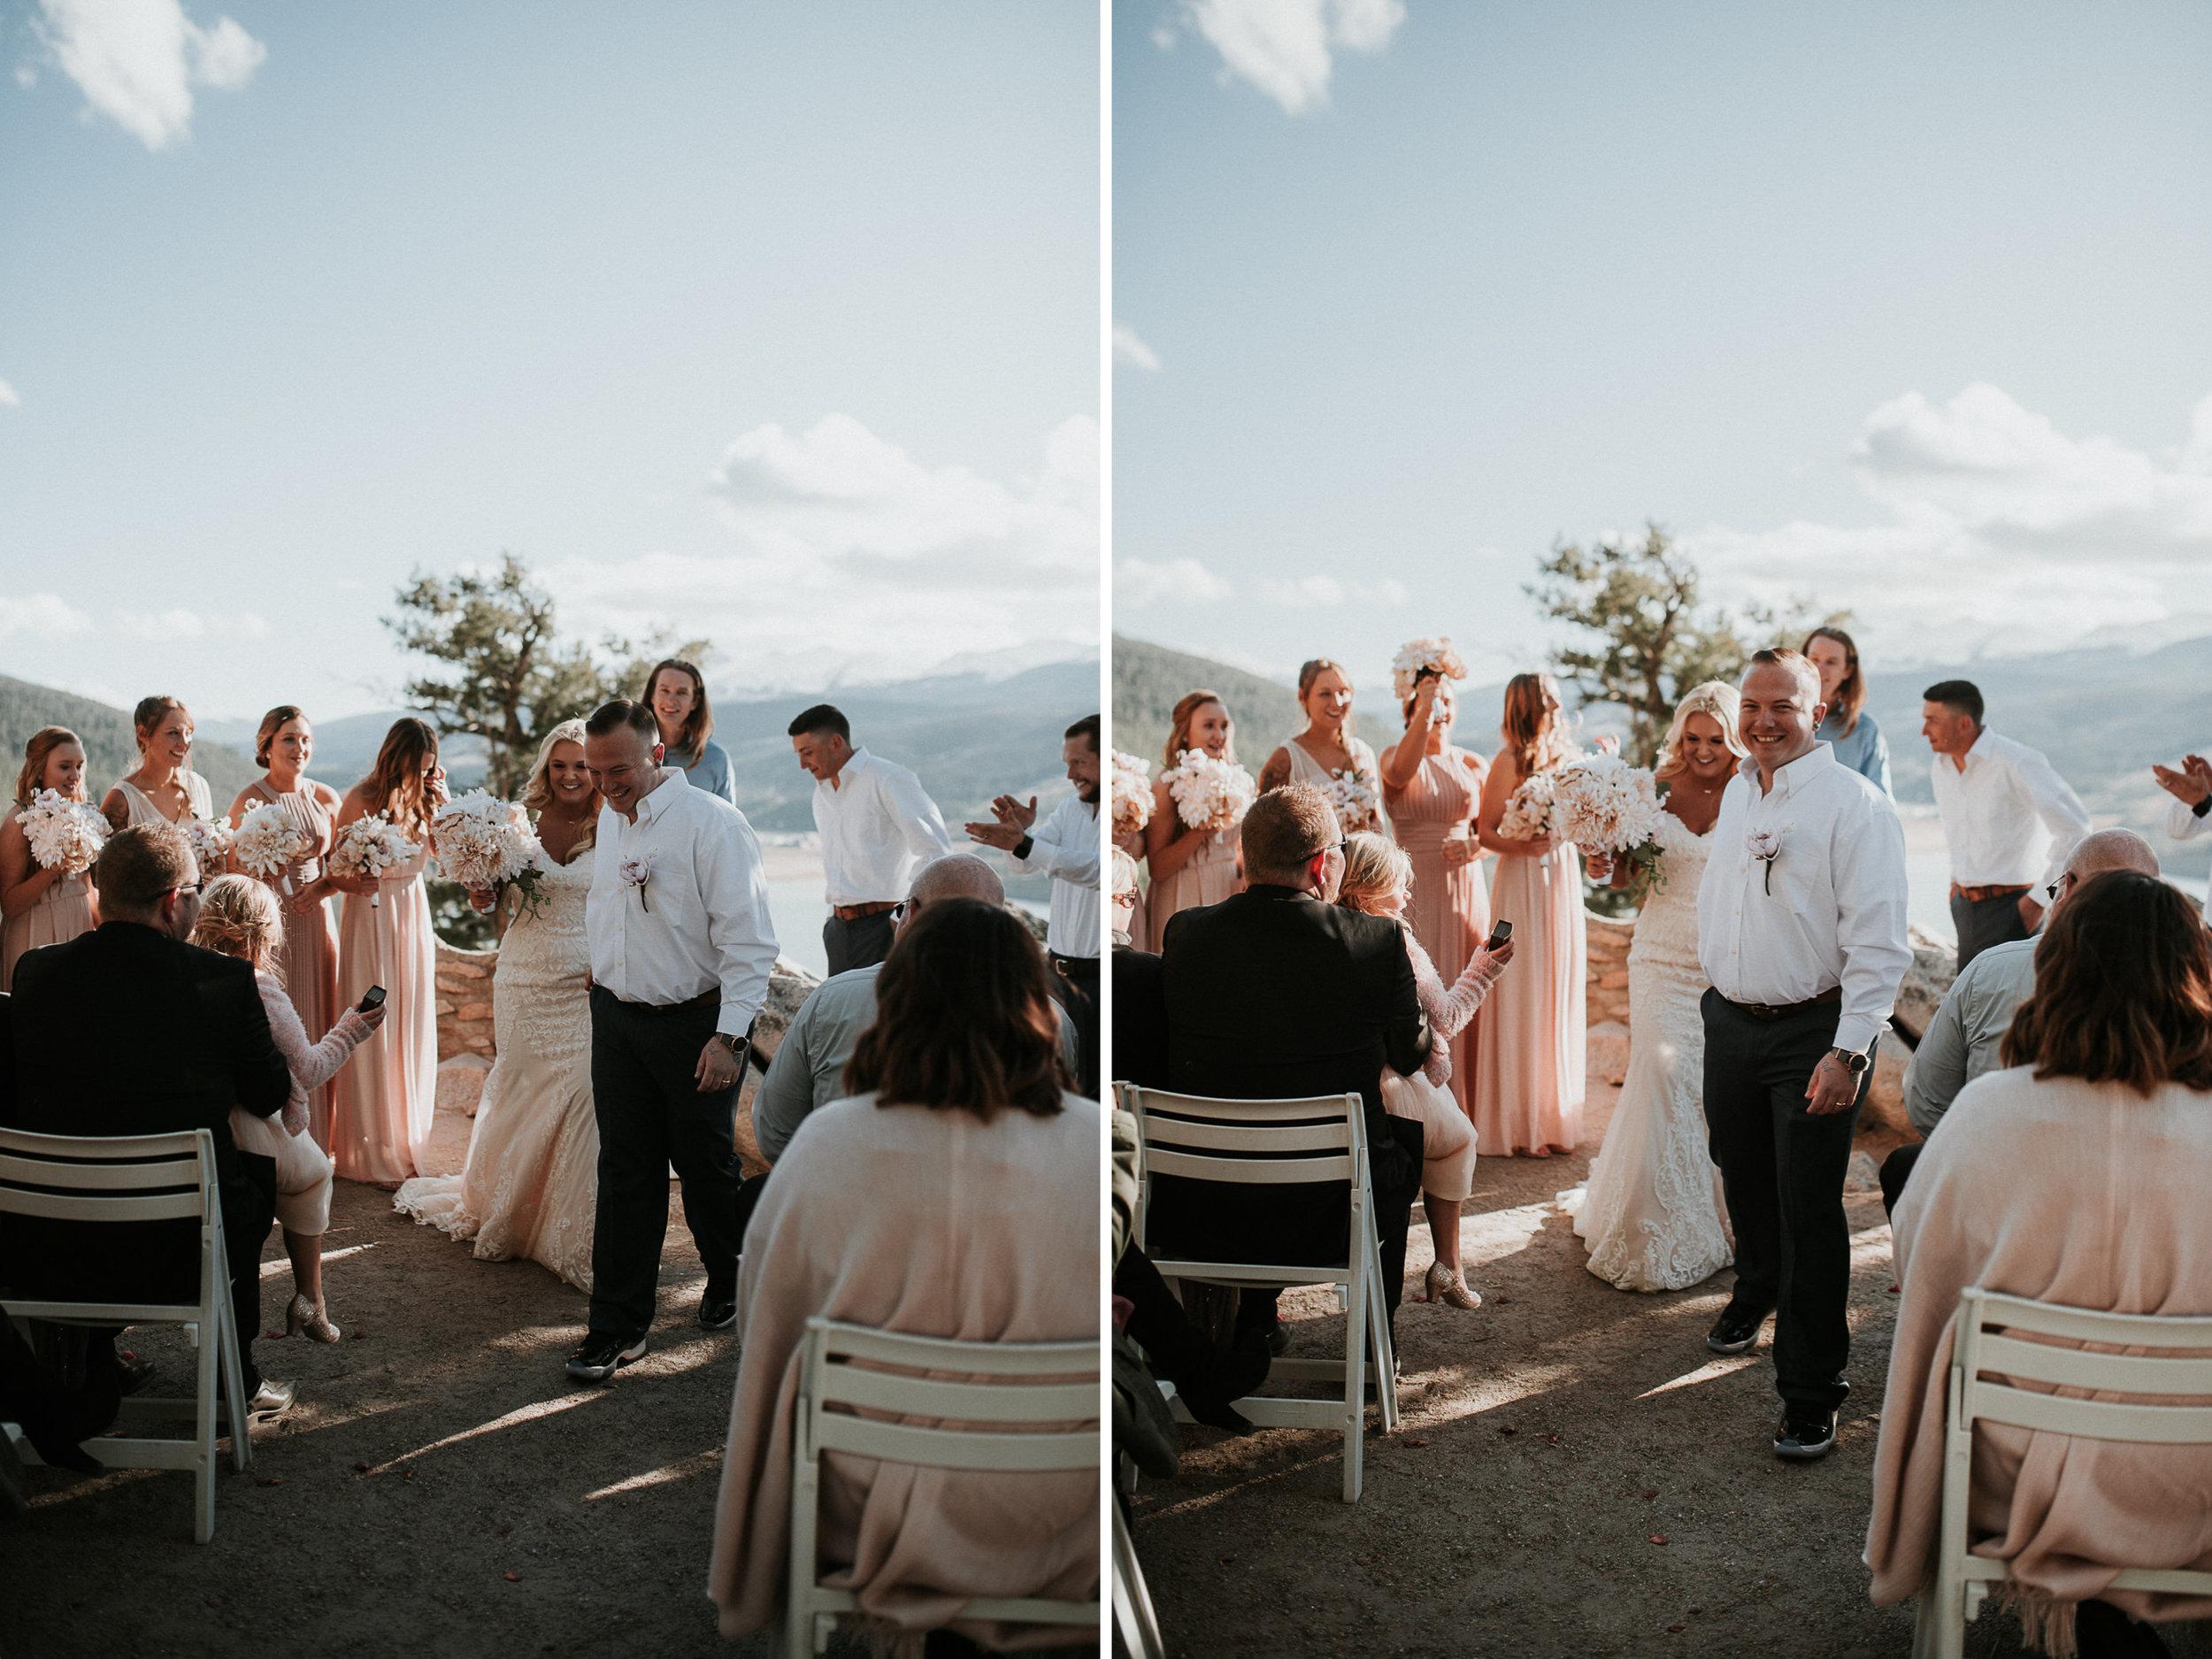 st. louis wedding photographer Zach&Rosalie - Lake Dillon CO Elopement 9.jpg